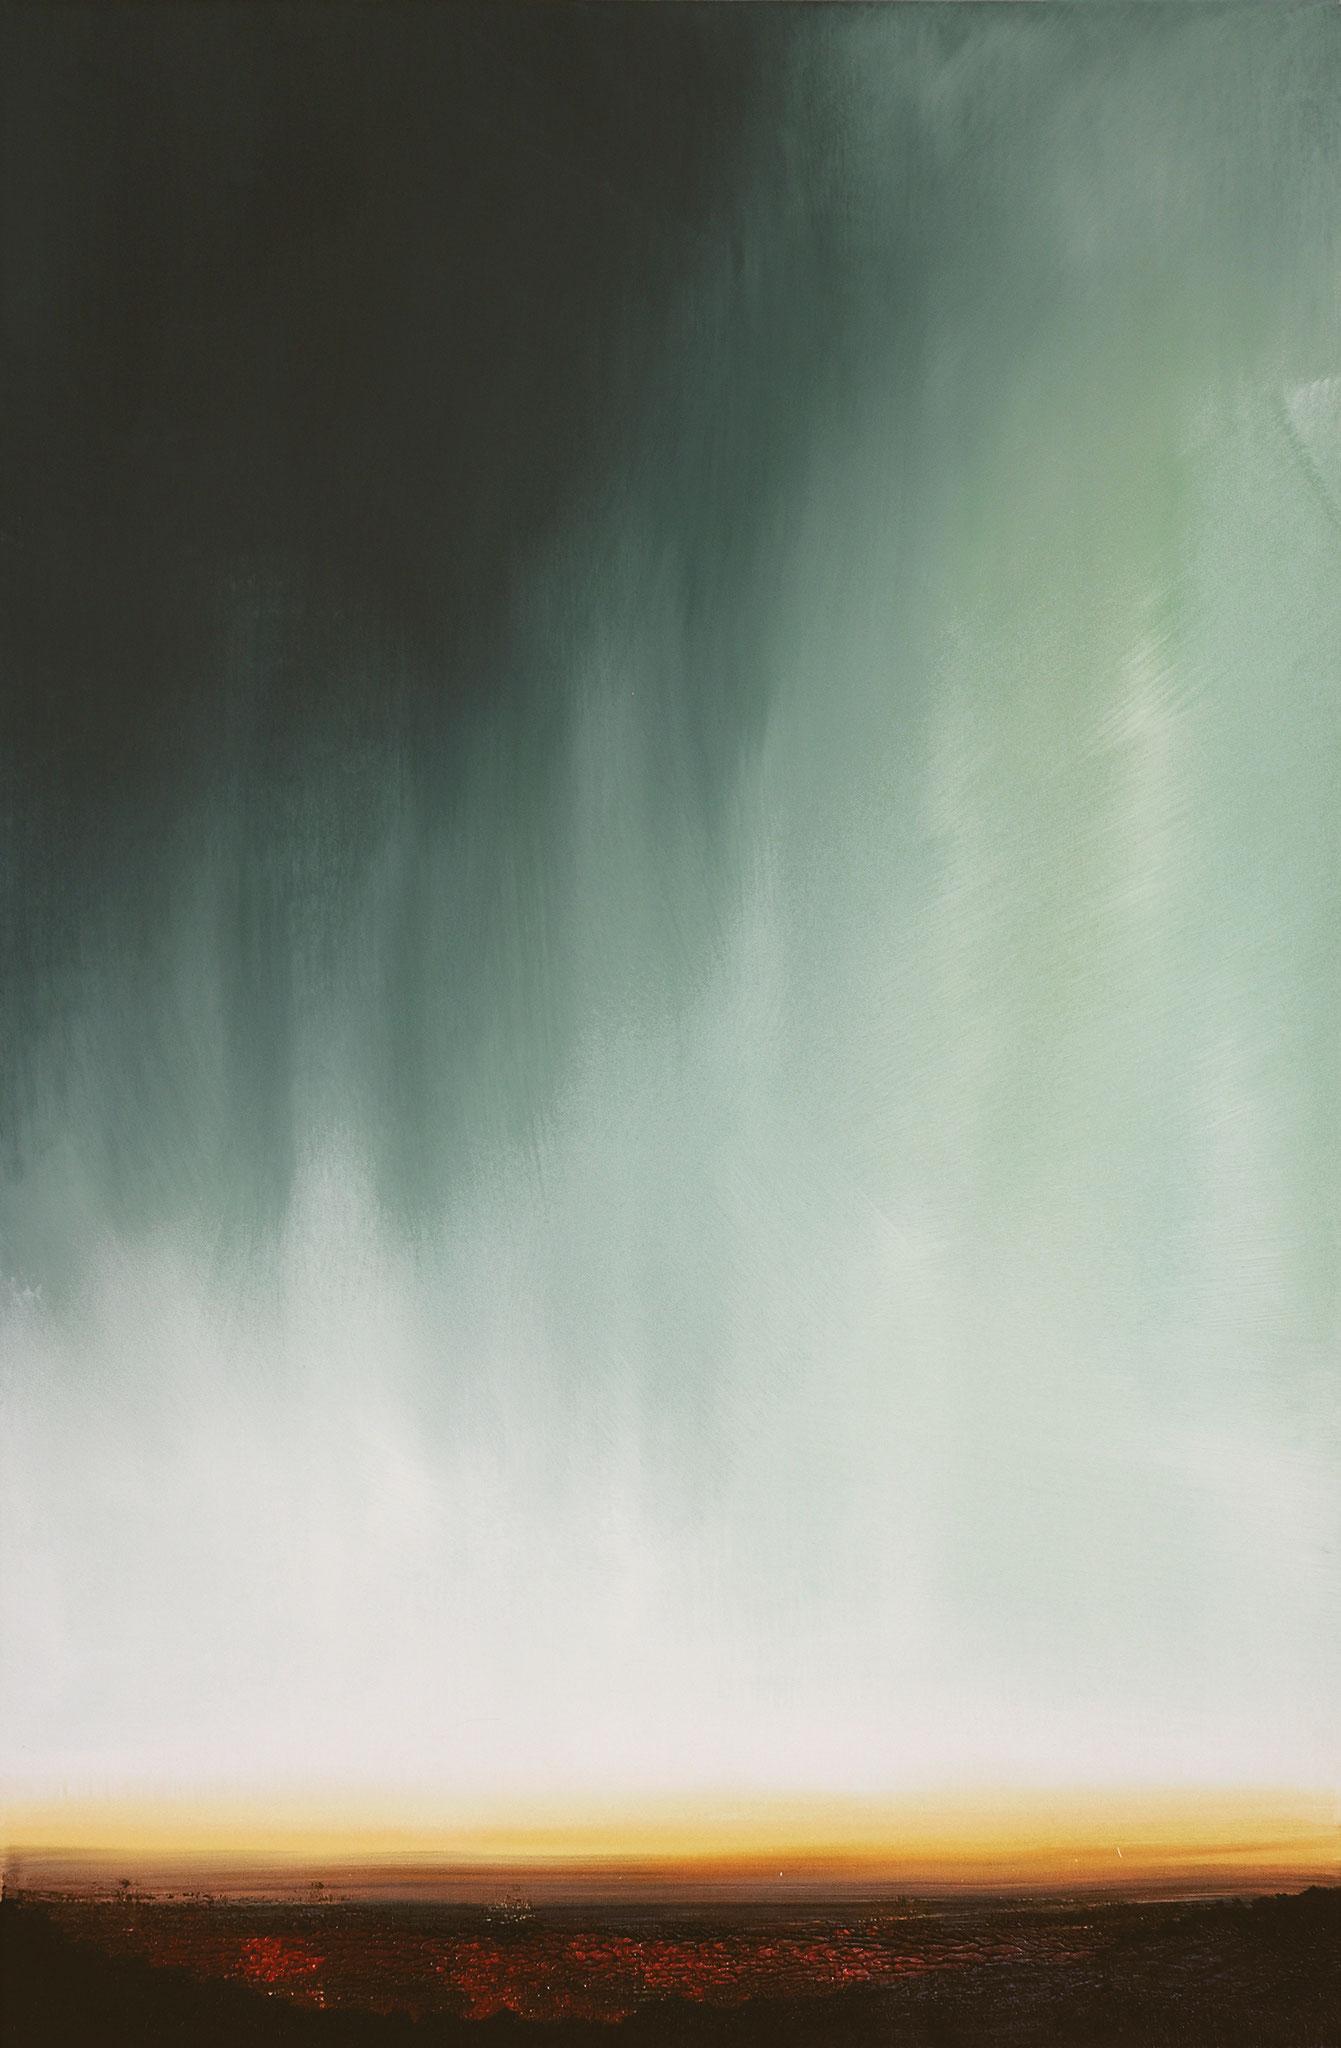 ›Valley‹, Acryl auf Leinwand, 80 x 120 cm, 2016